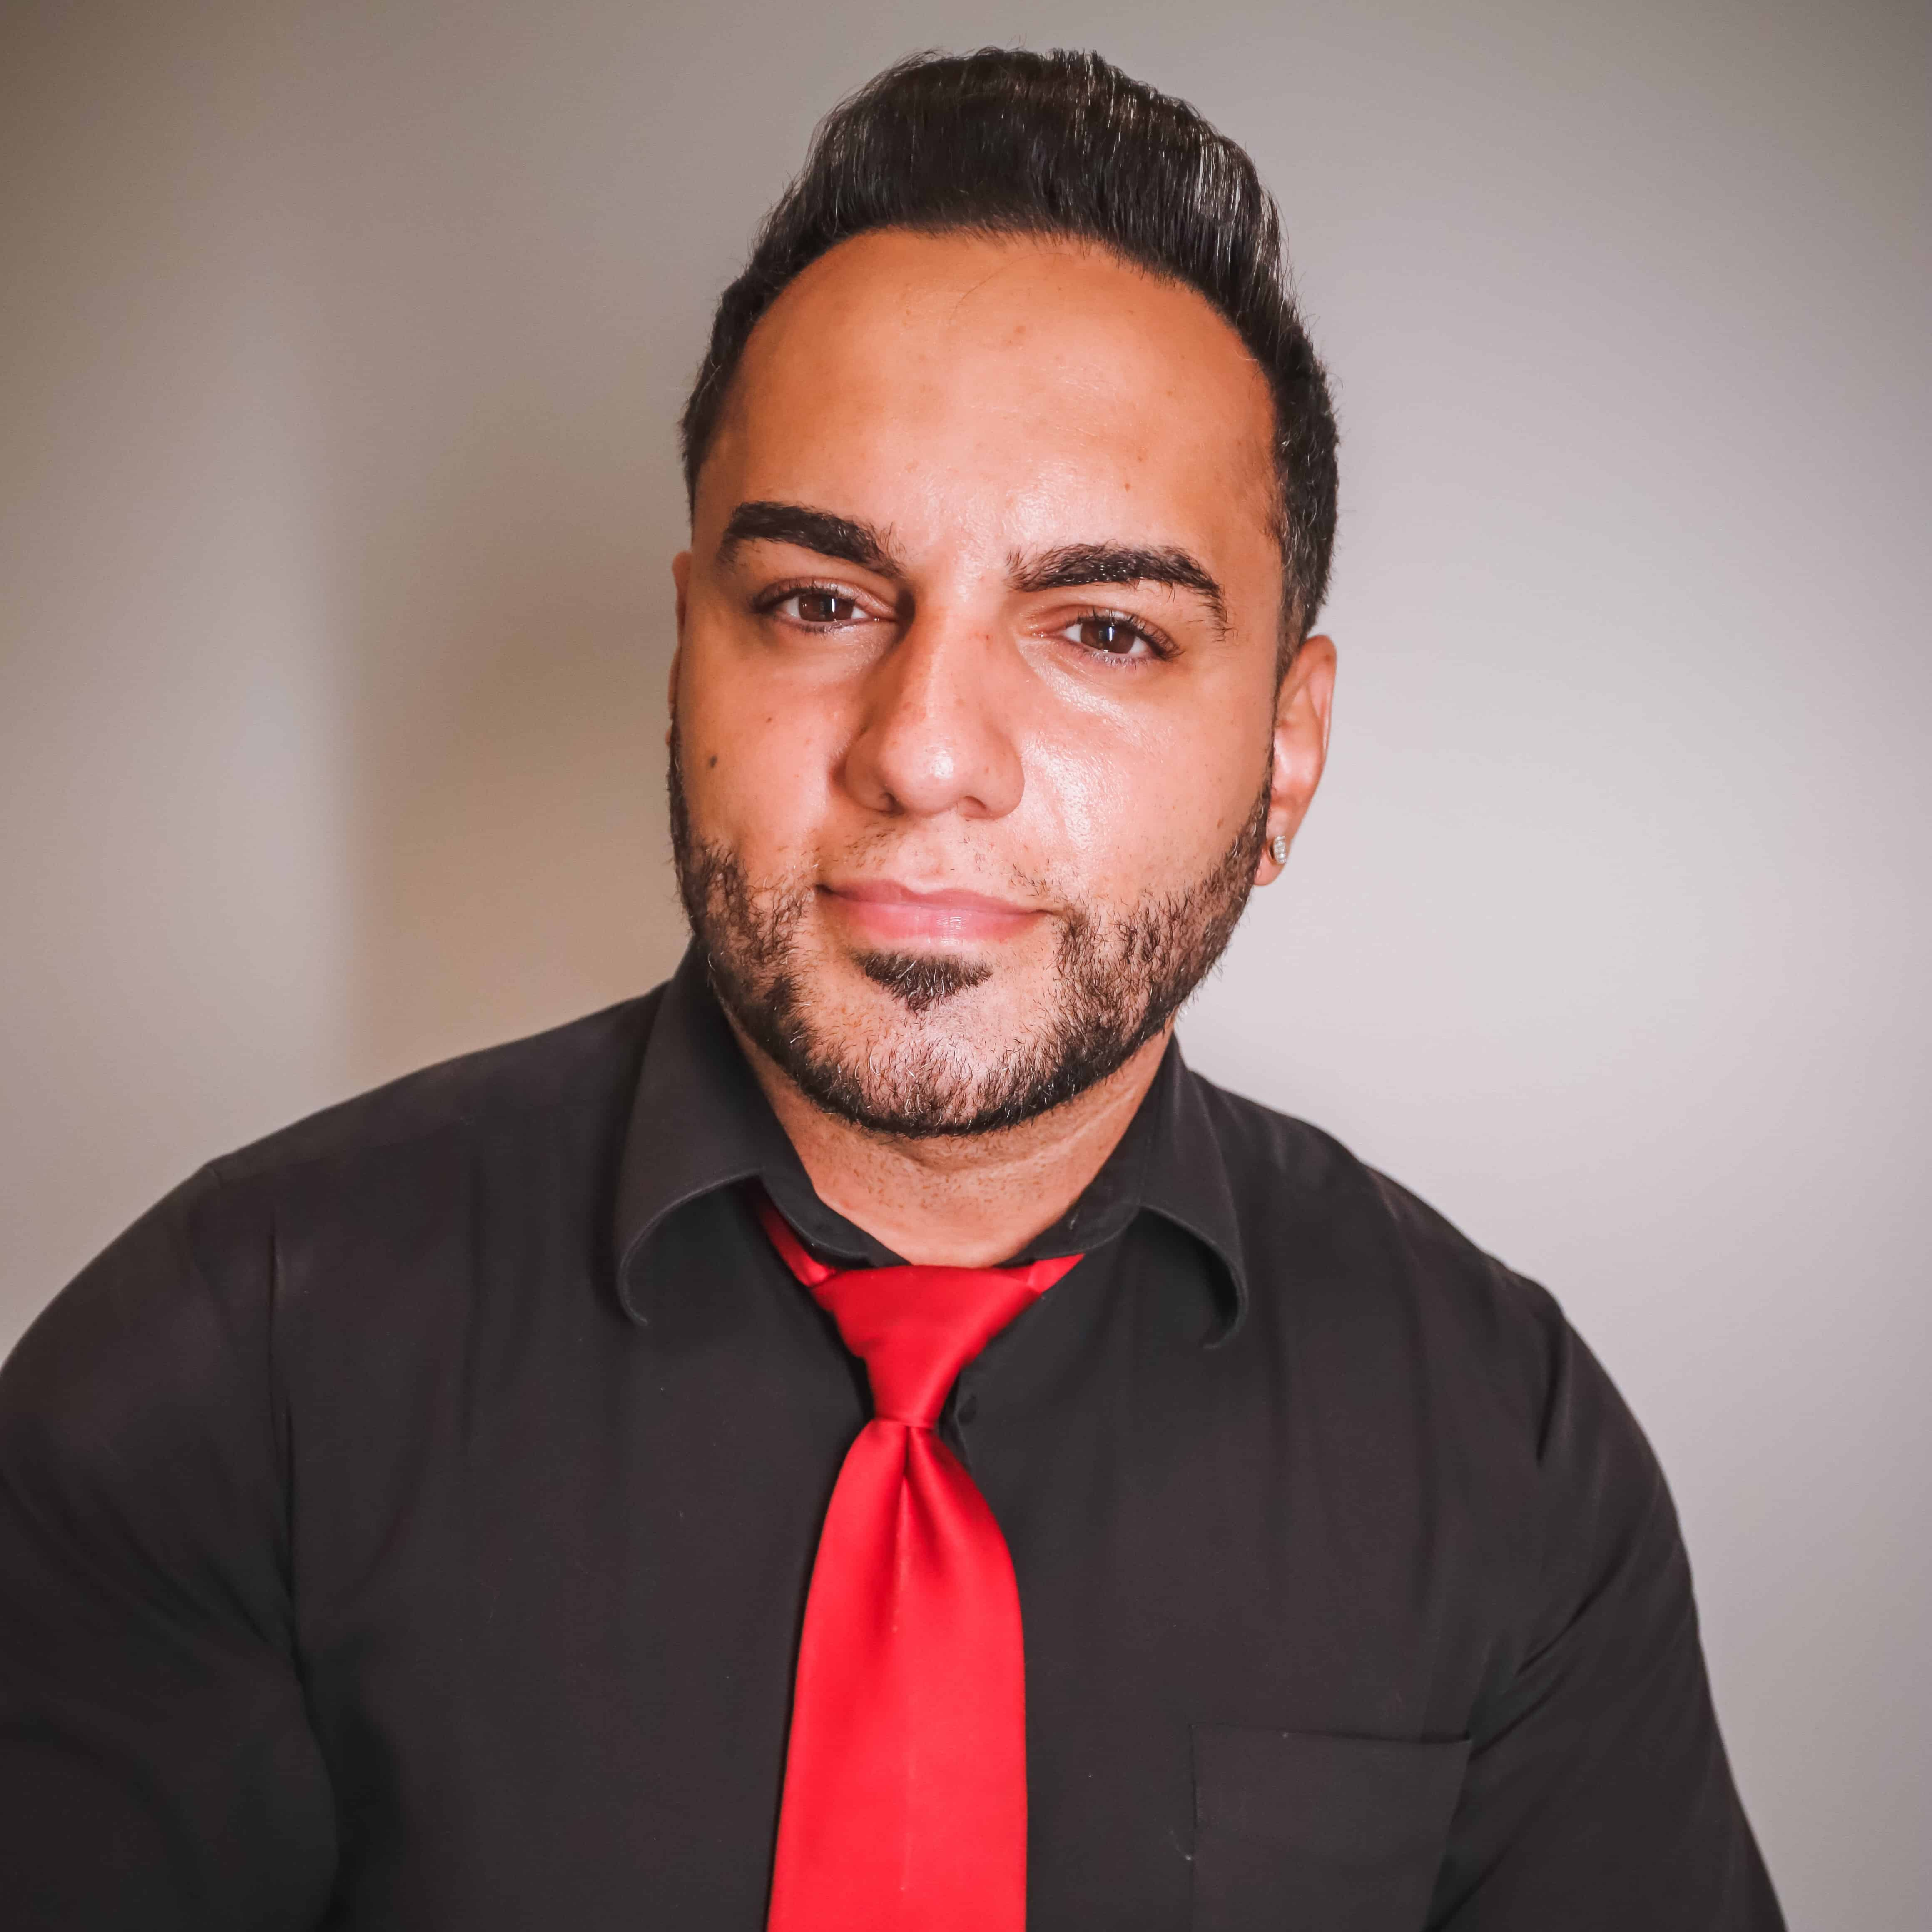 Renan Farias